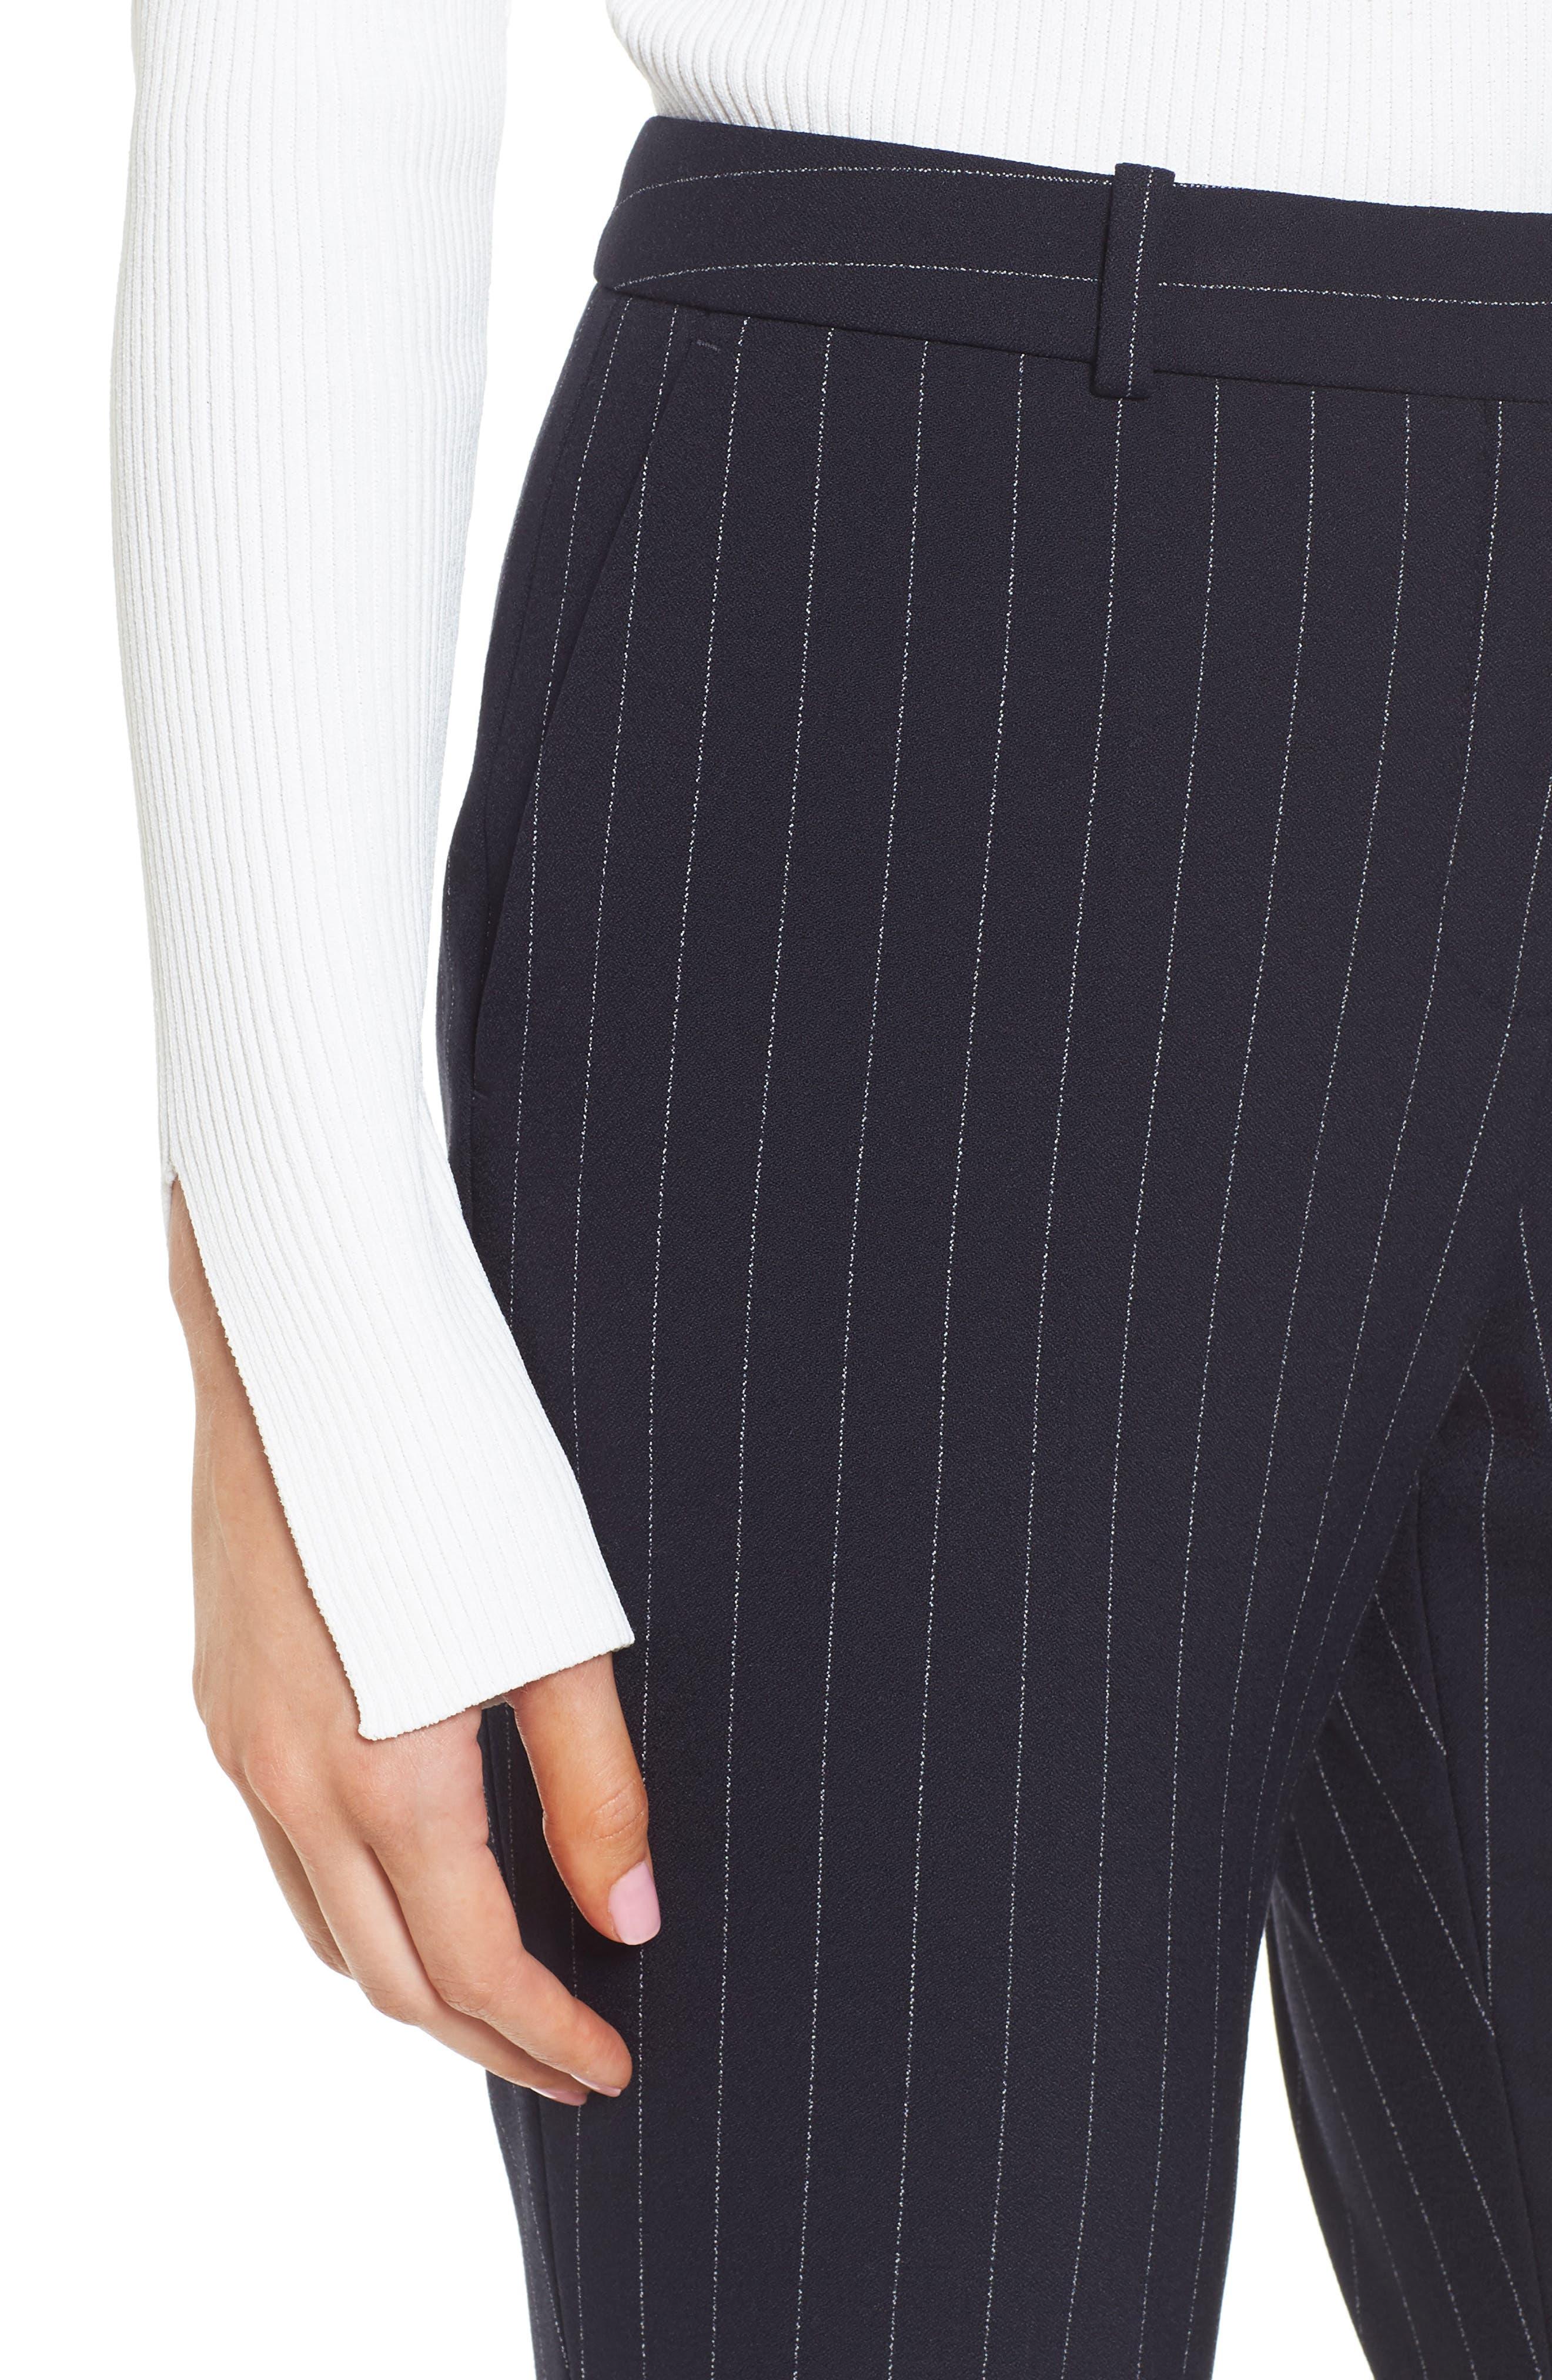 Titana Pinstripe Suit Trousers,                             Alternate thumbnail 6, color,                             Navy Fantasy